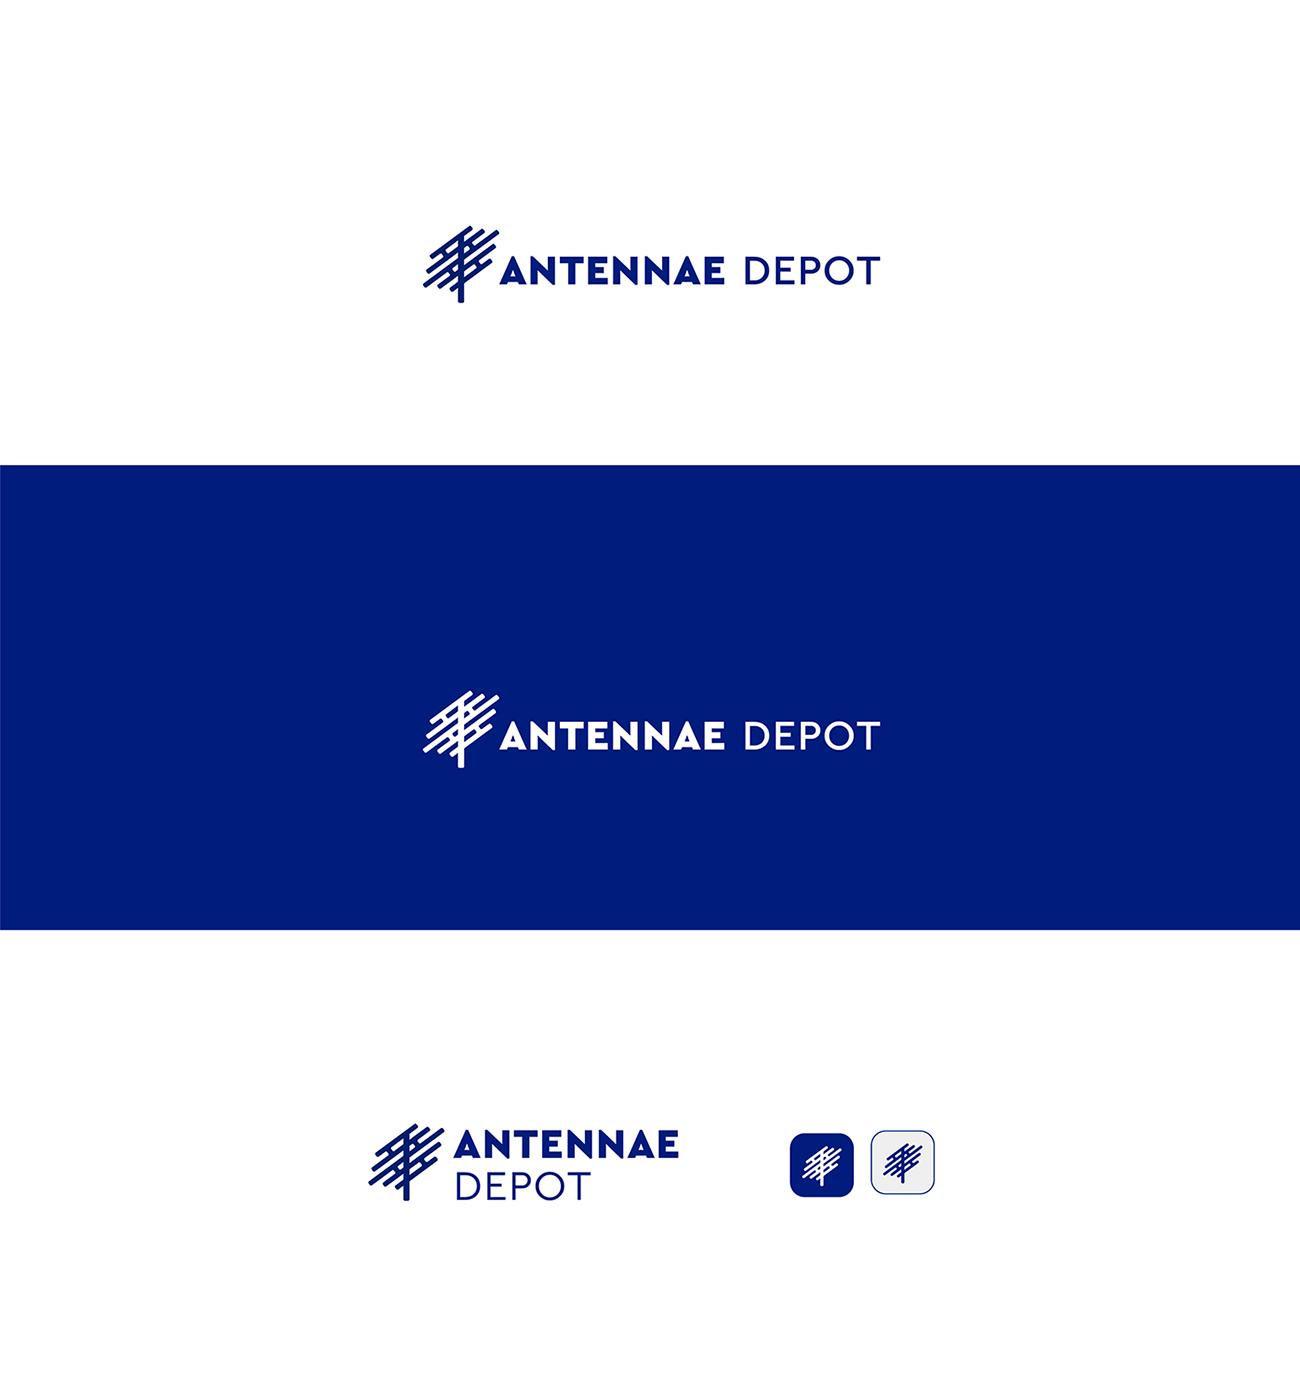 Обновить логотип фото f_9485de74d0a25fc9.jpg